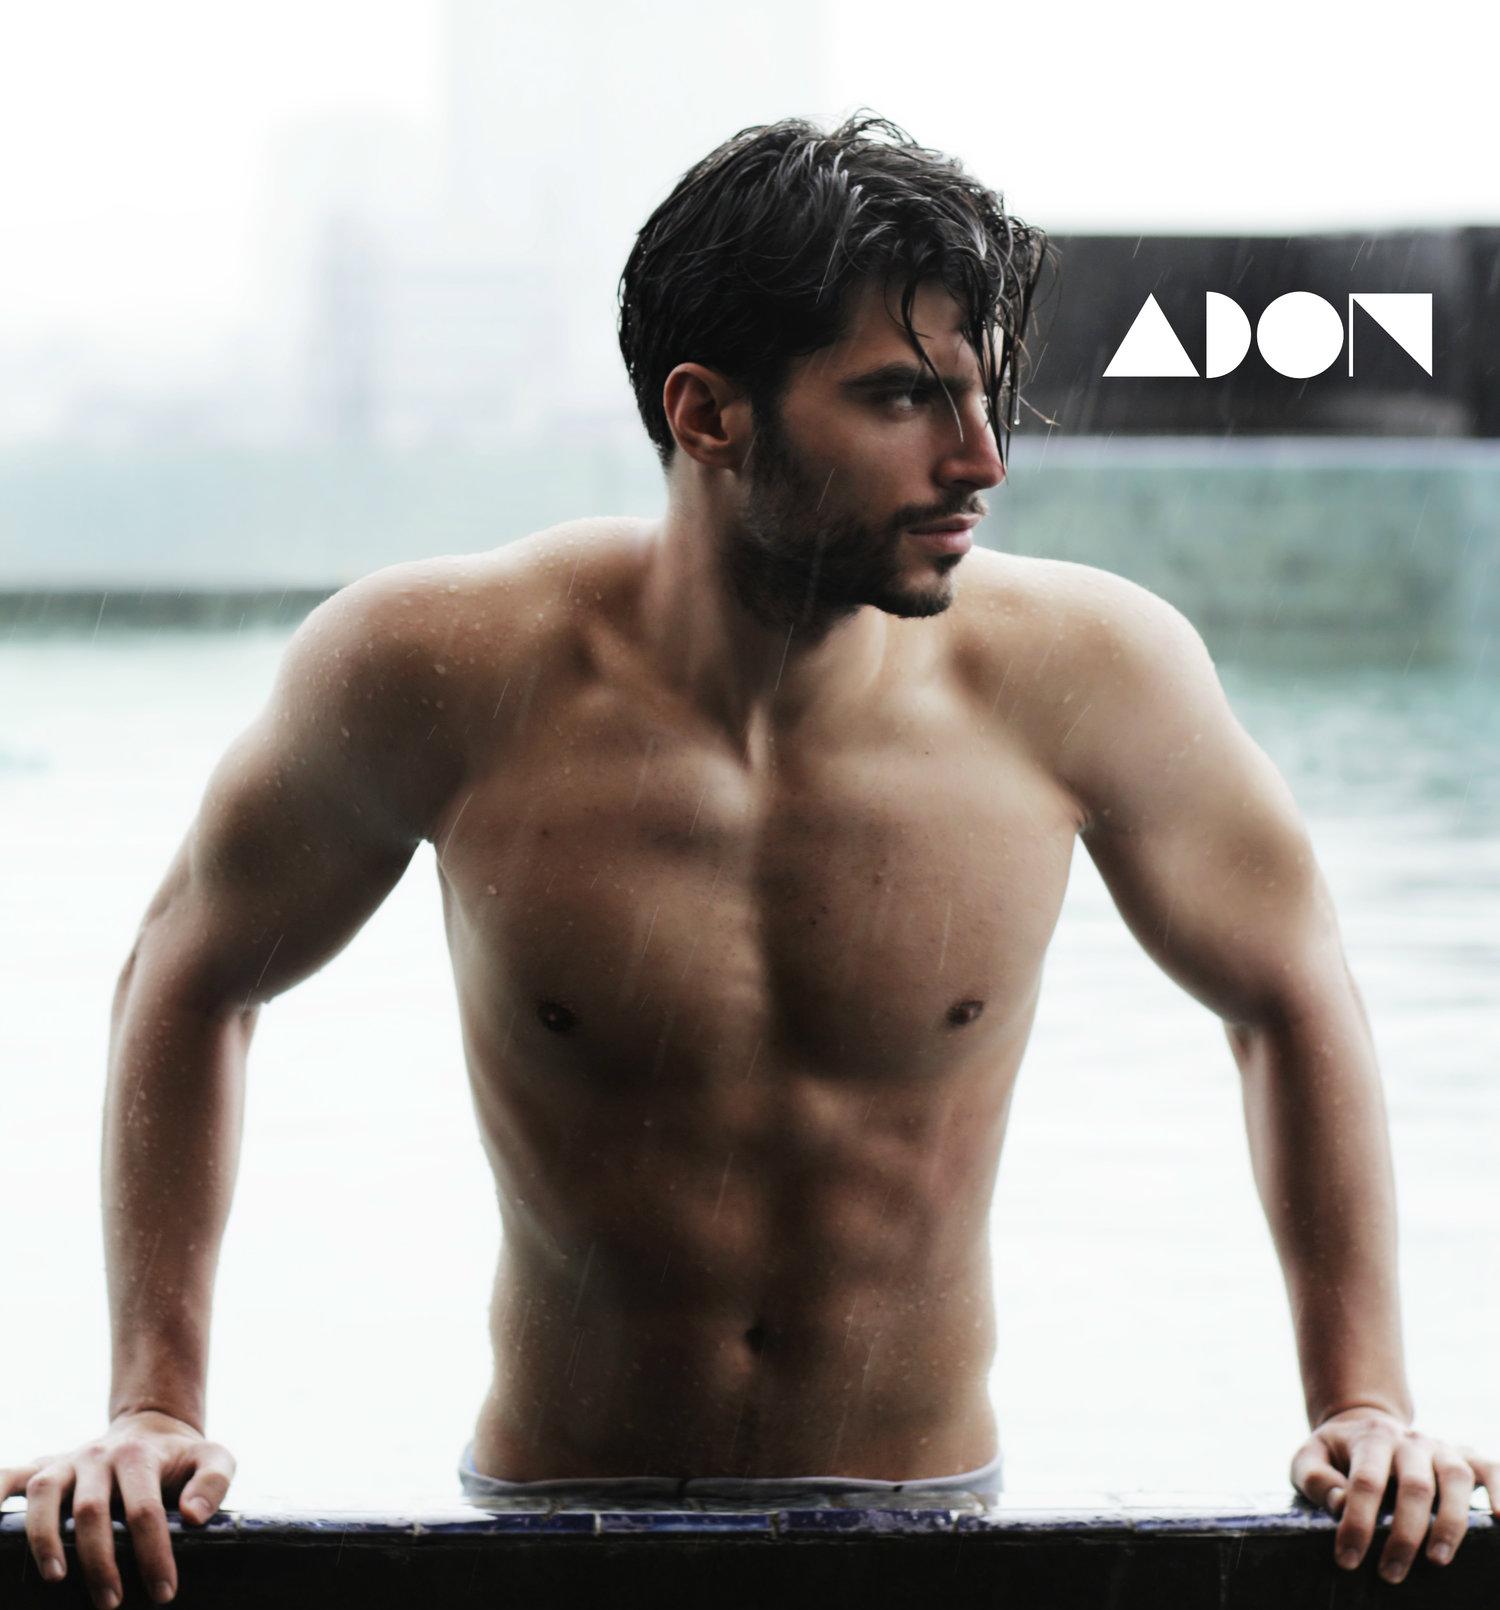 Adon Exclusive: Model Aleksa Gavrilović By Sofyan Hendik